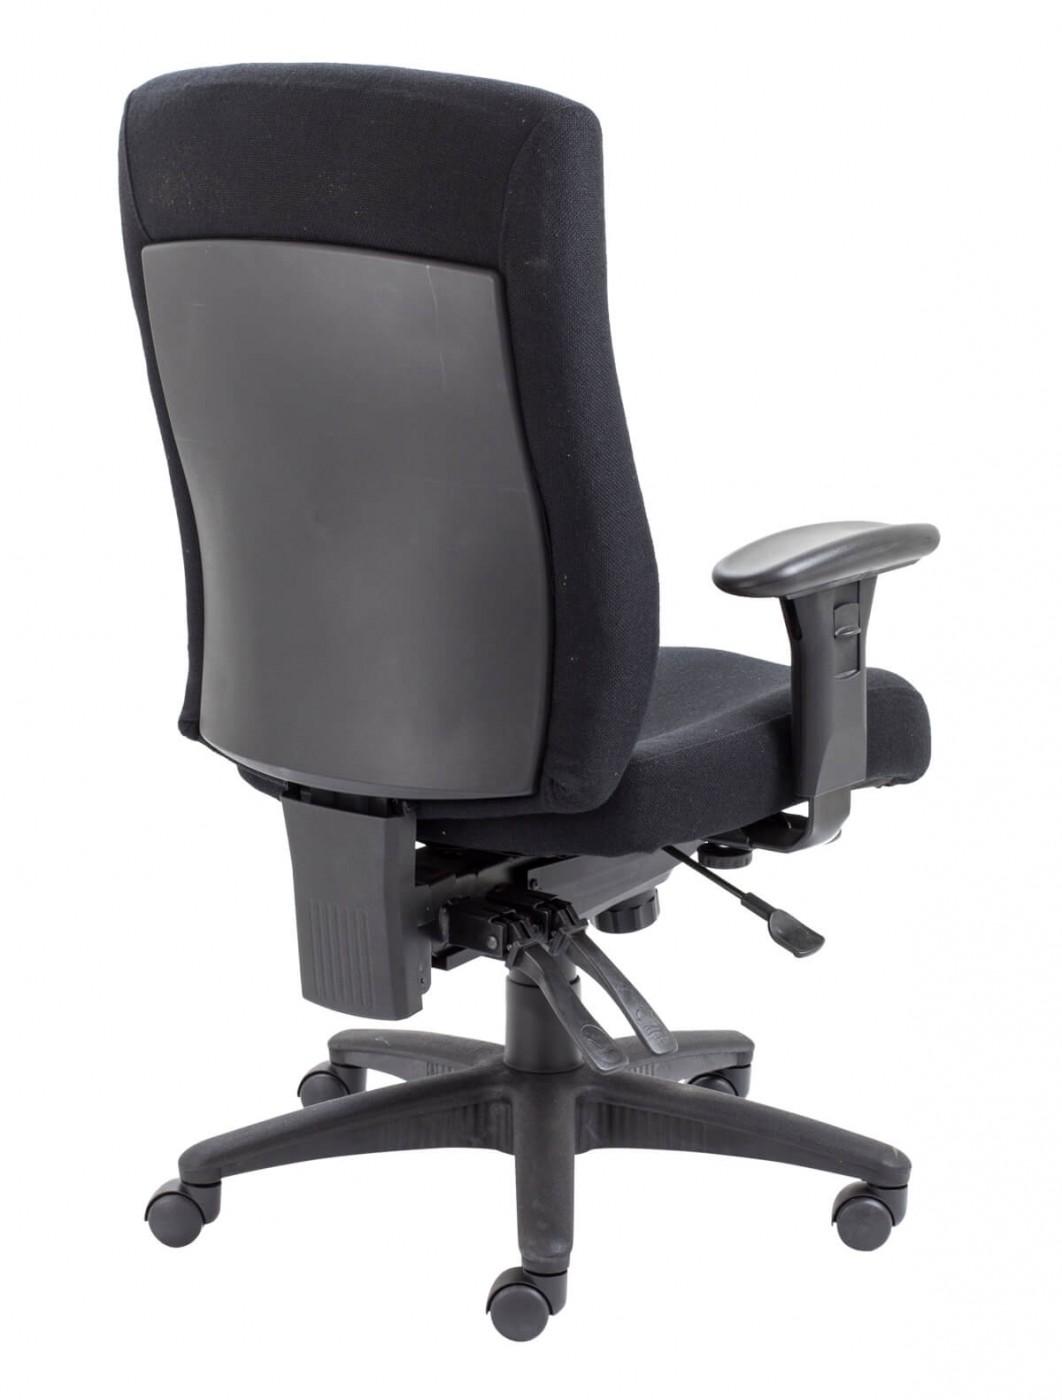 heavy duty gaming chair dorm bed bath beyond office chairs marathon ch1106bk